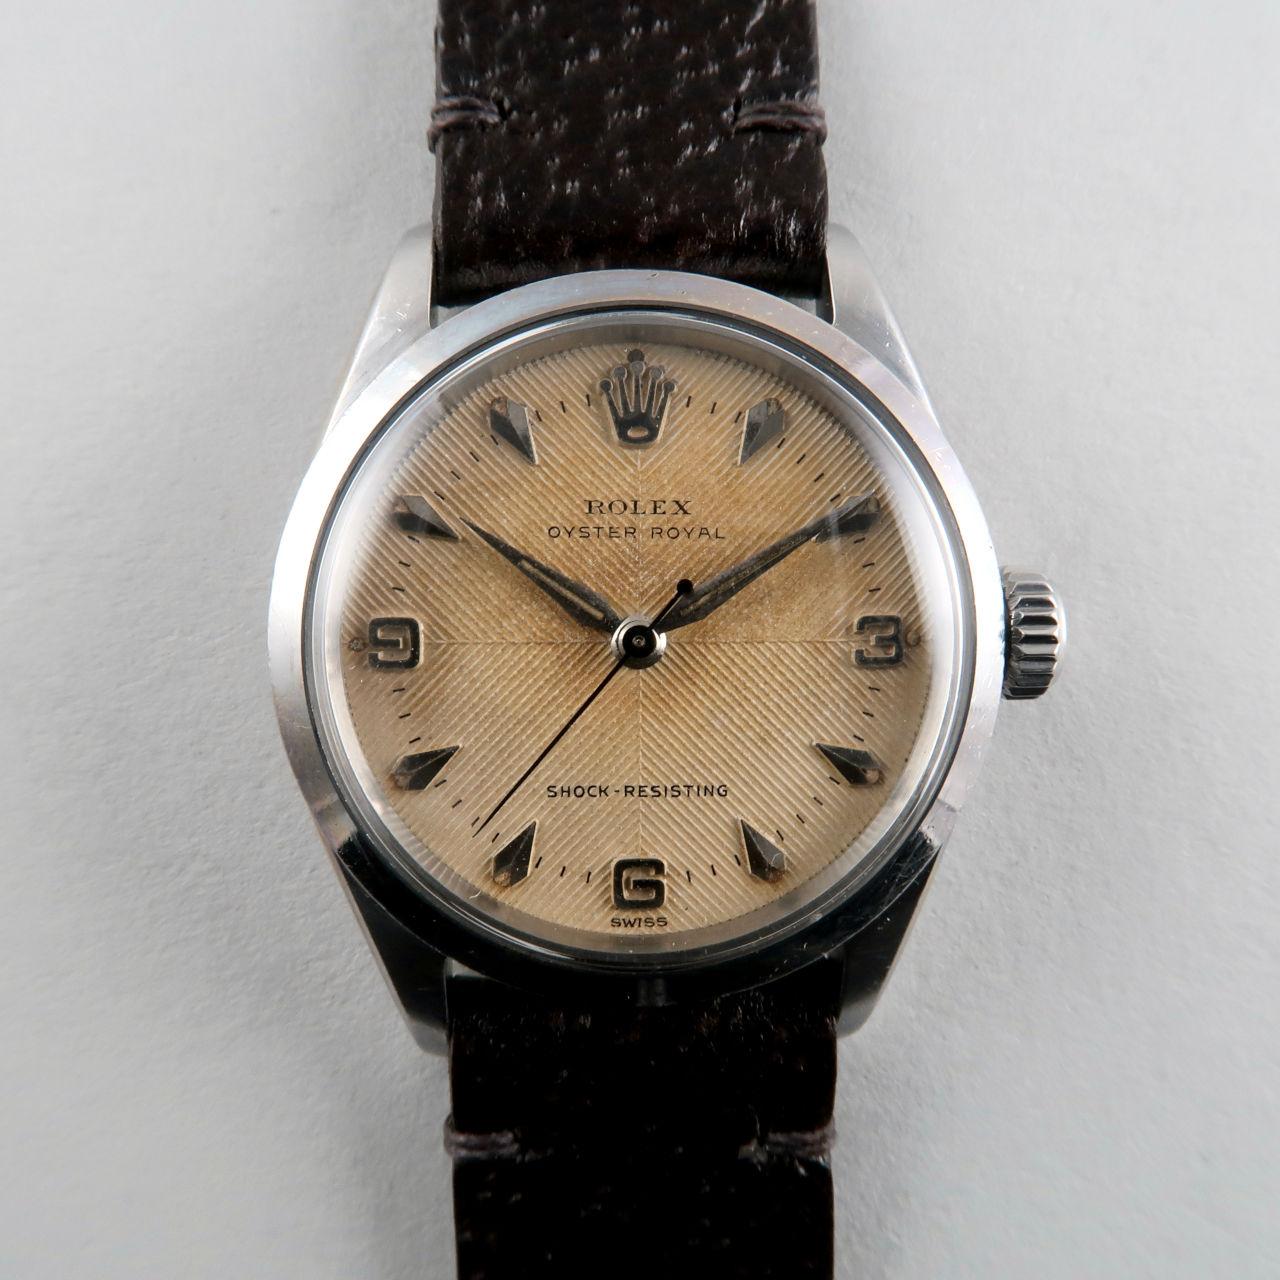 Rolex Oyster Royal Ref. 6246 dated 1957   steel herring-bone sector dial vintage wristwatch